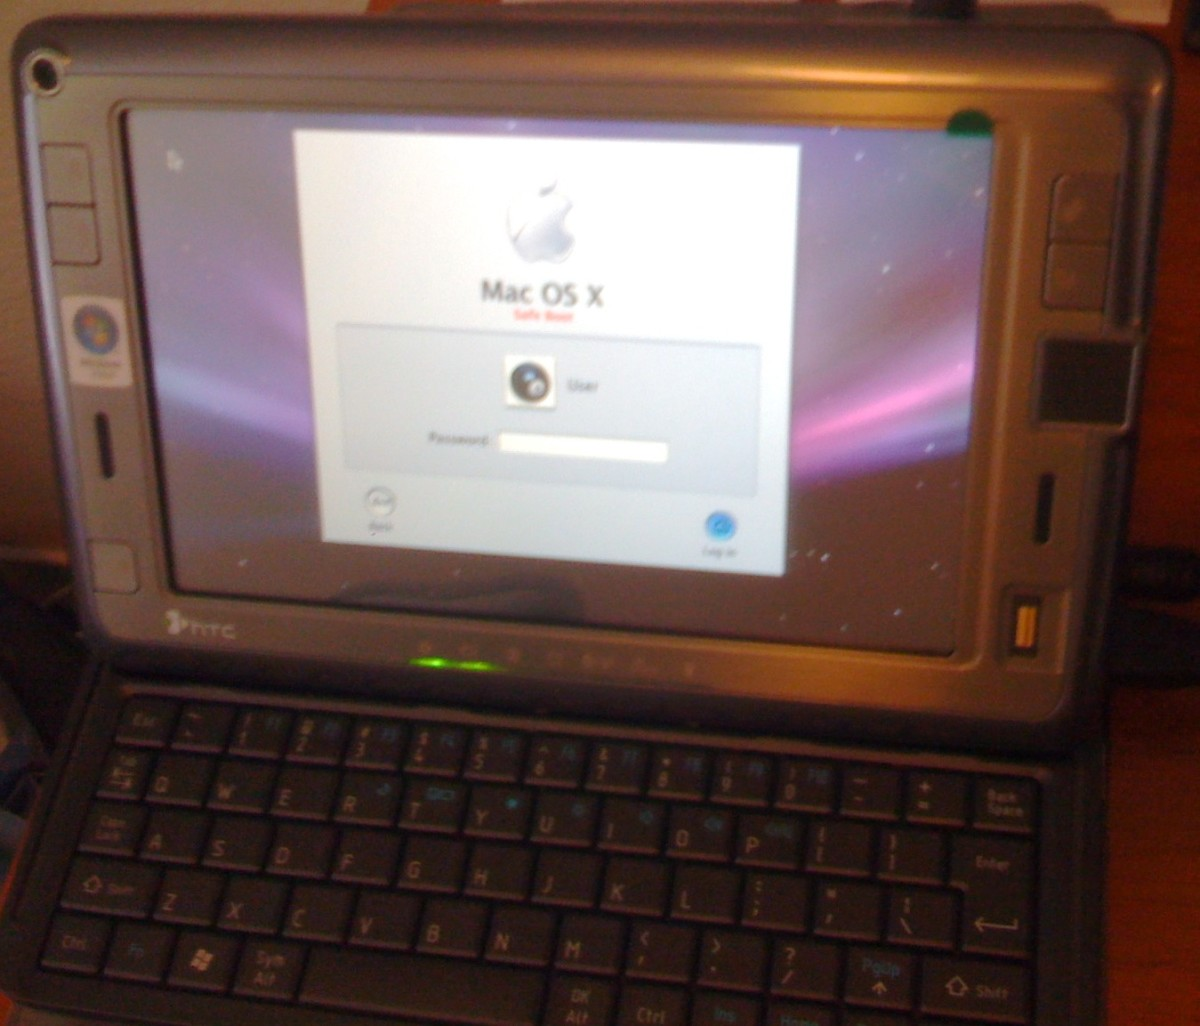 Coming Soon... HTC Shift (into) Mac